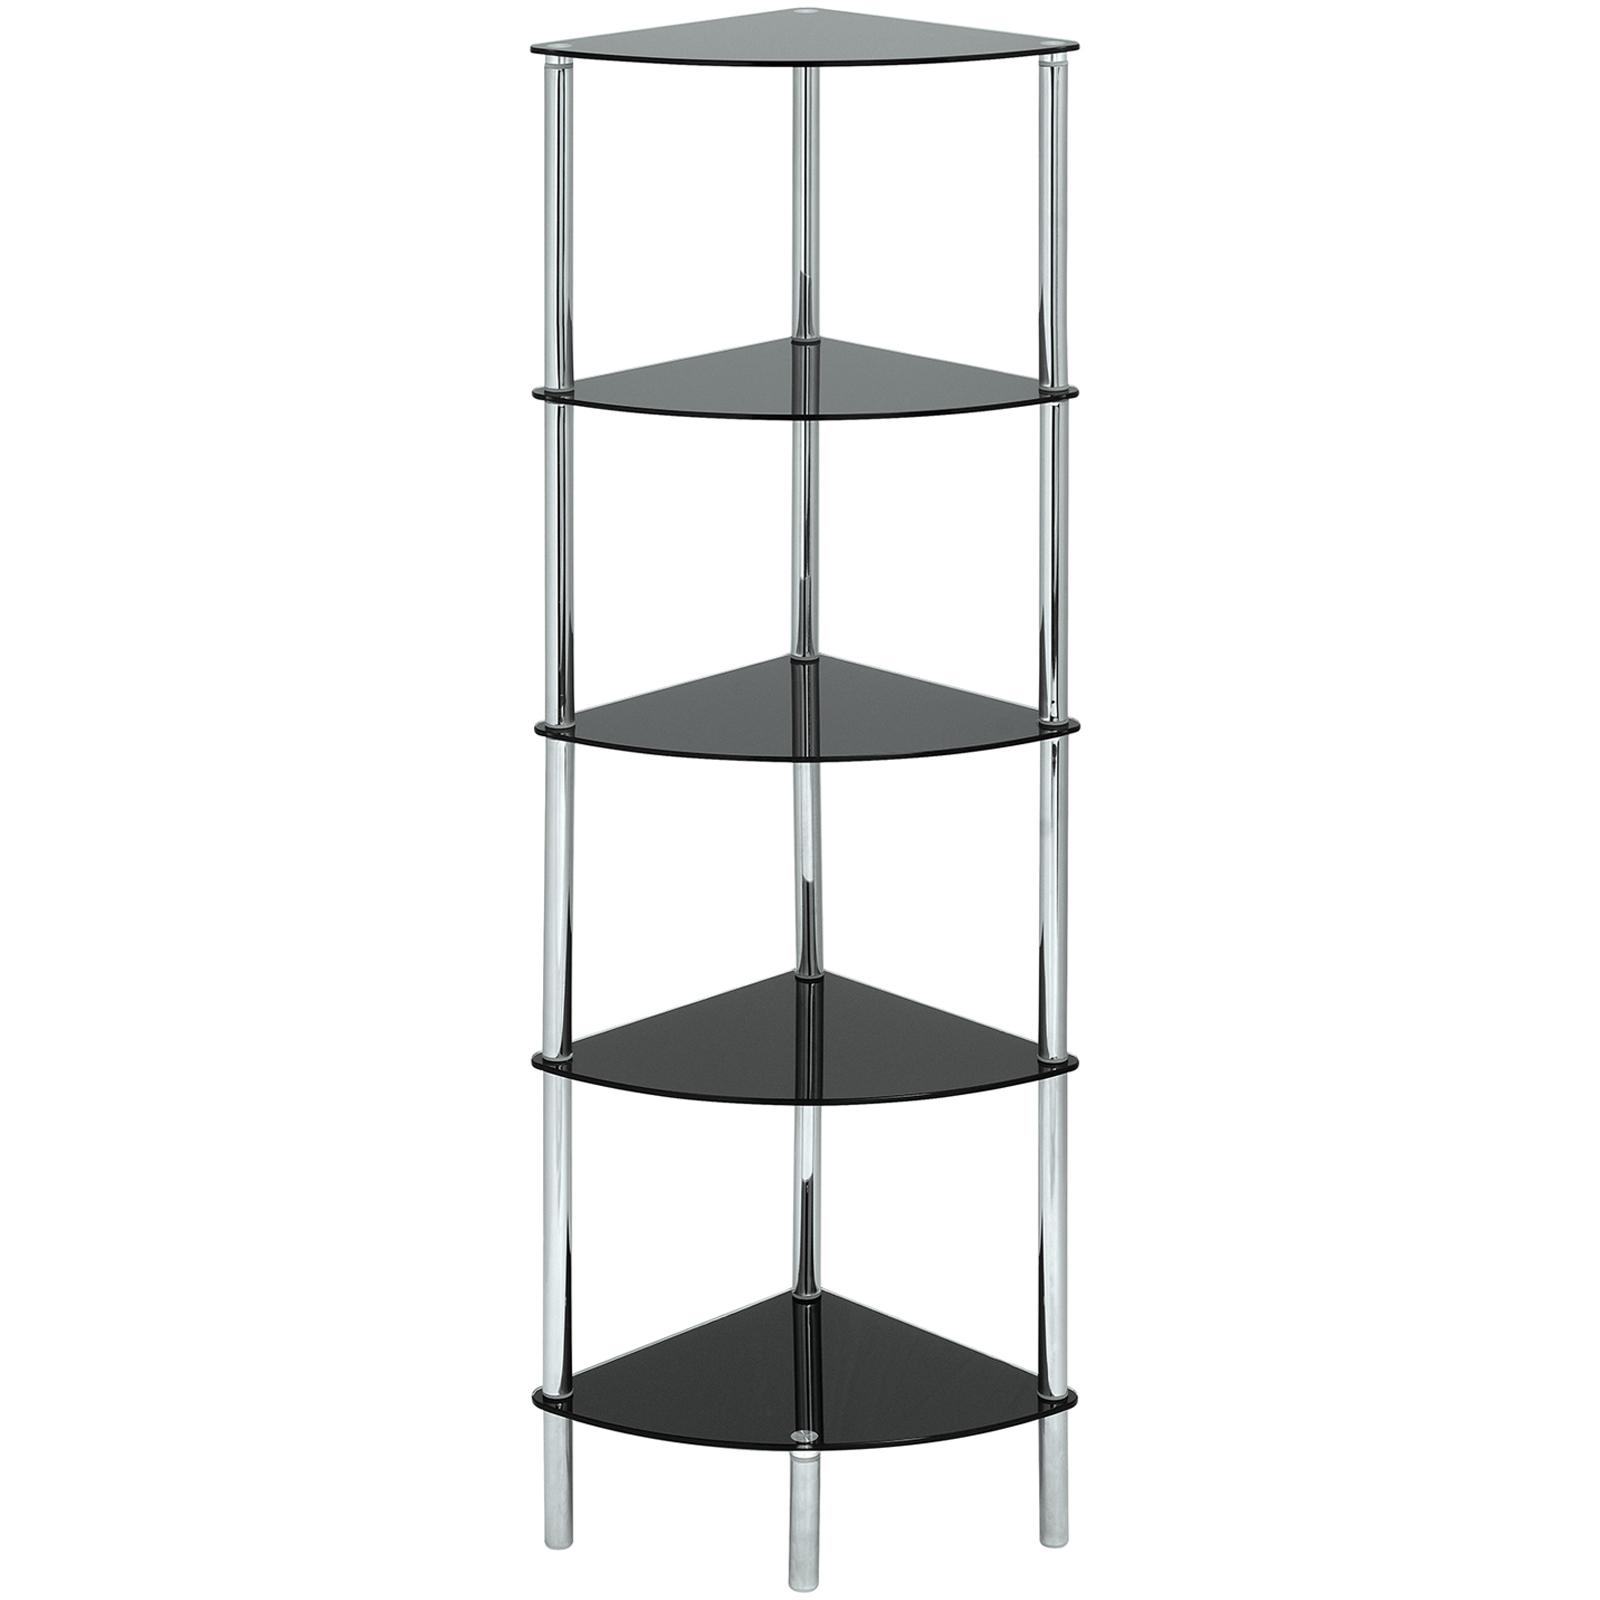 glass corner shelf unit display bathroom hall end lamp coffee table home storage ebay. Black Bedroom Furniture Sets. Home Design Ideas